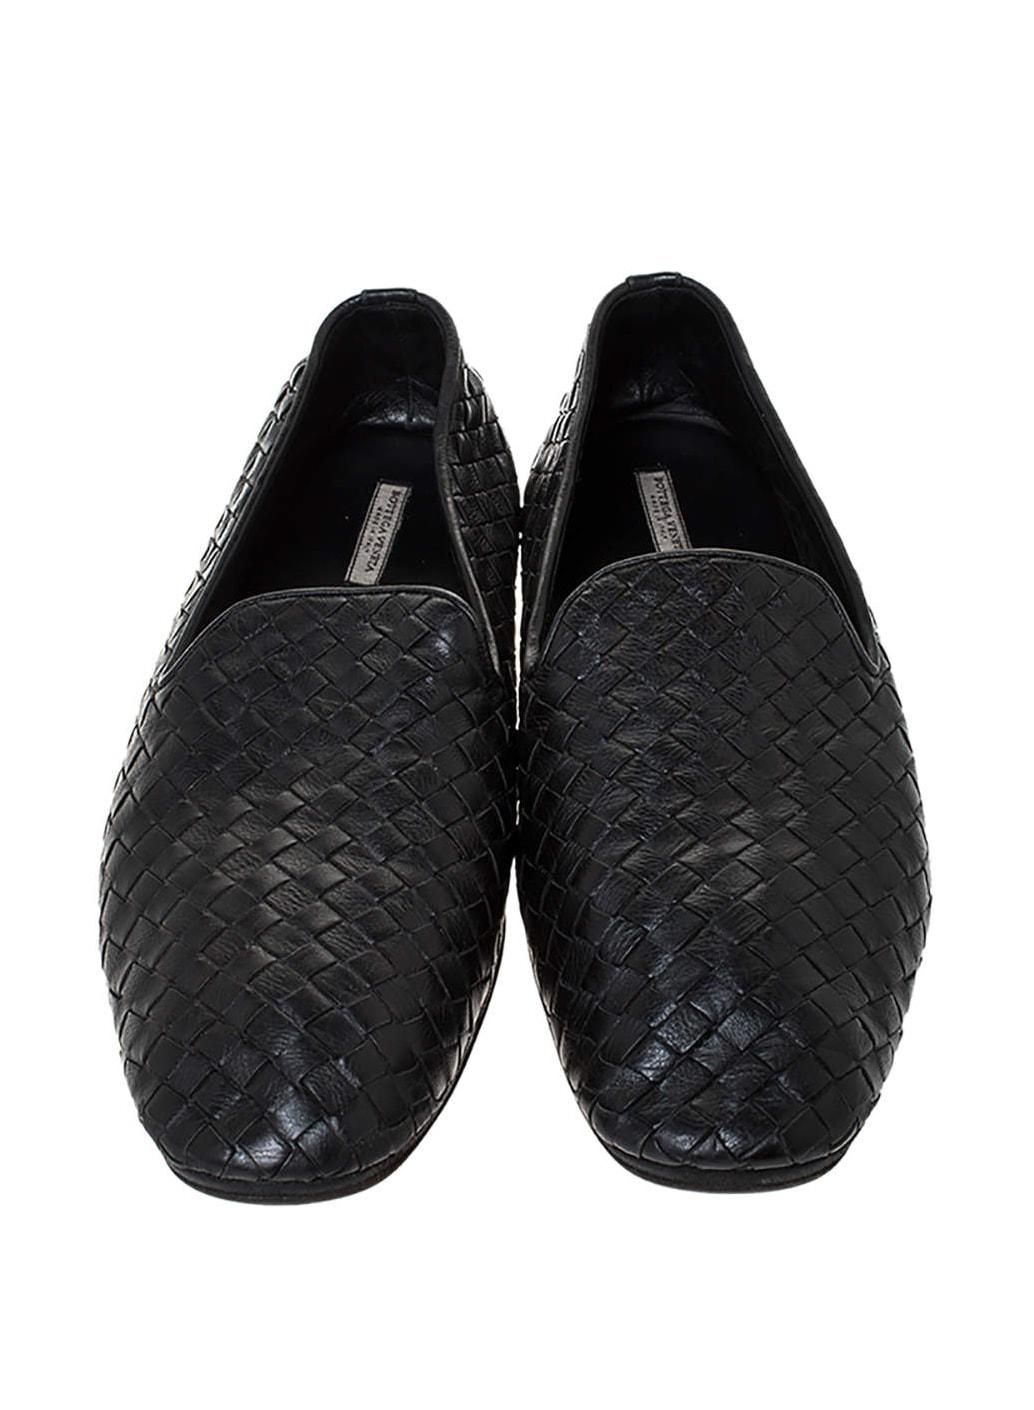 BOTTEGA VENETA Bottega Veneta Black Intrecciato Leather Smoking Slippers Size 41